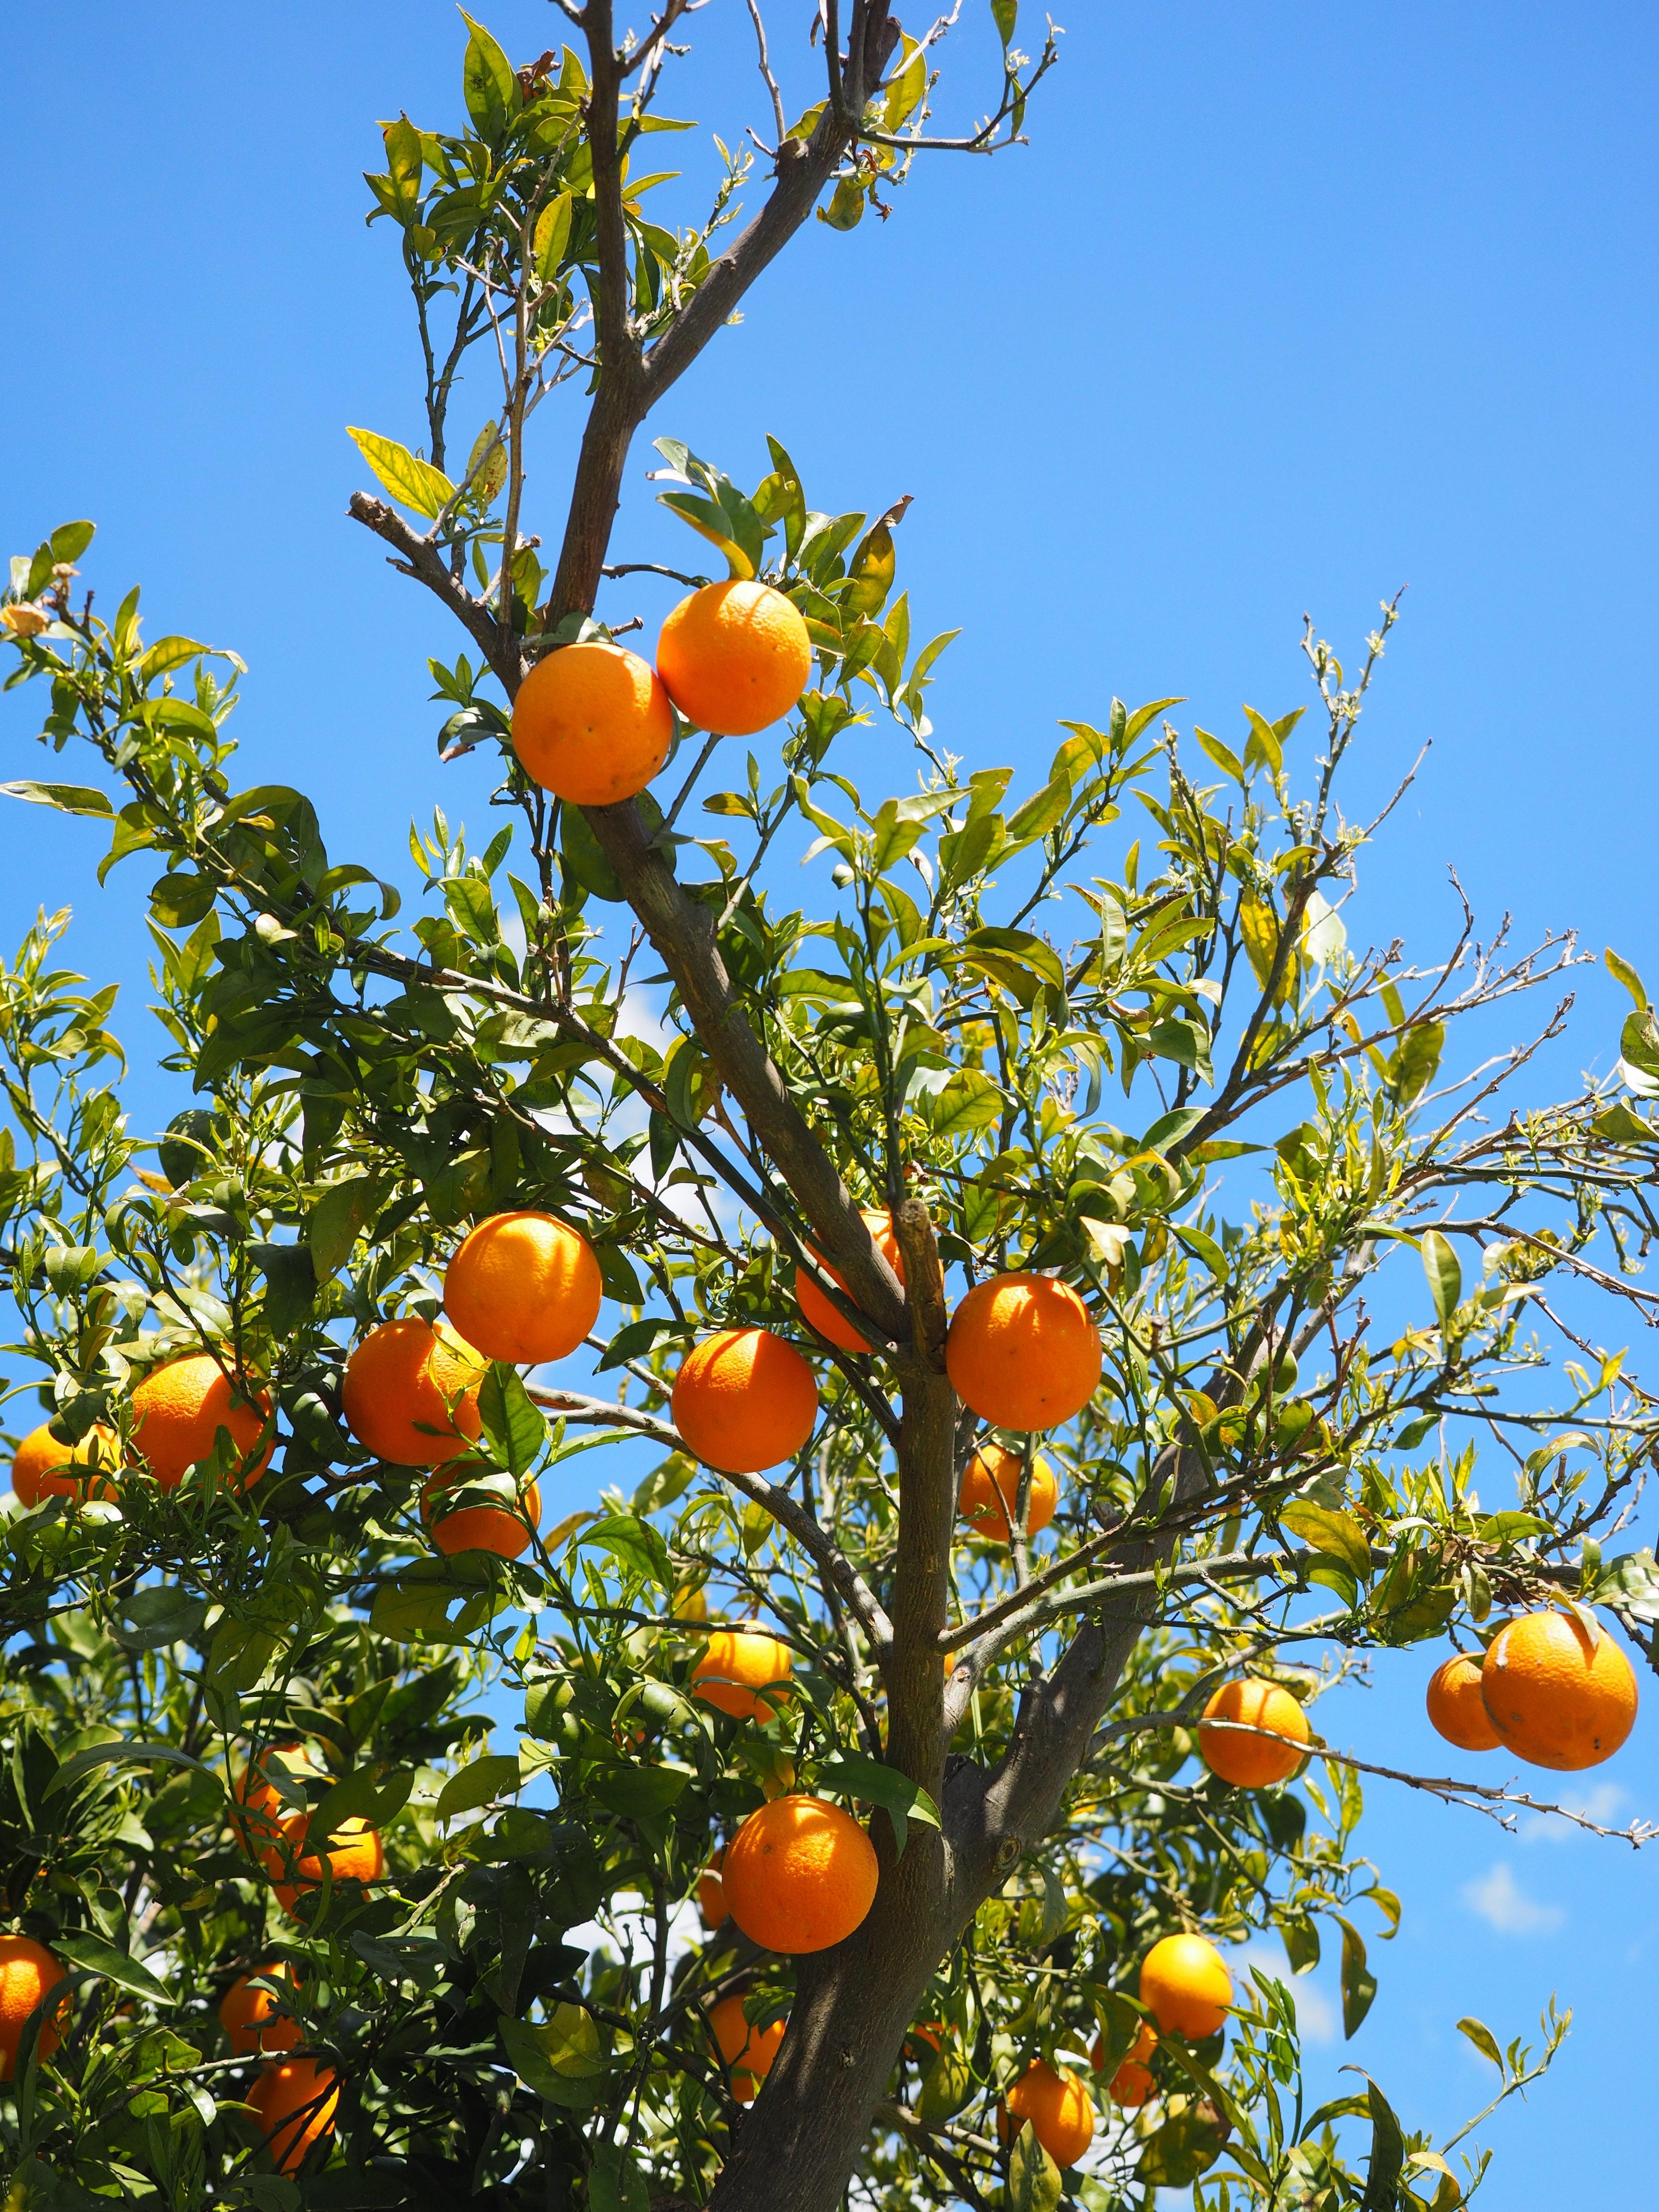 Tree Branch Plant Fruit Sweet Sunlight Flower Summer Ripe Bush Foliage Orange Food Mediterranean